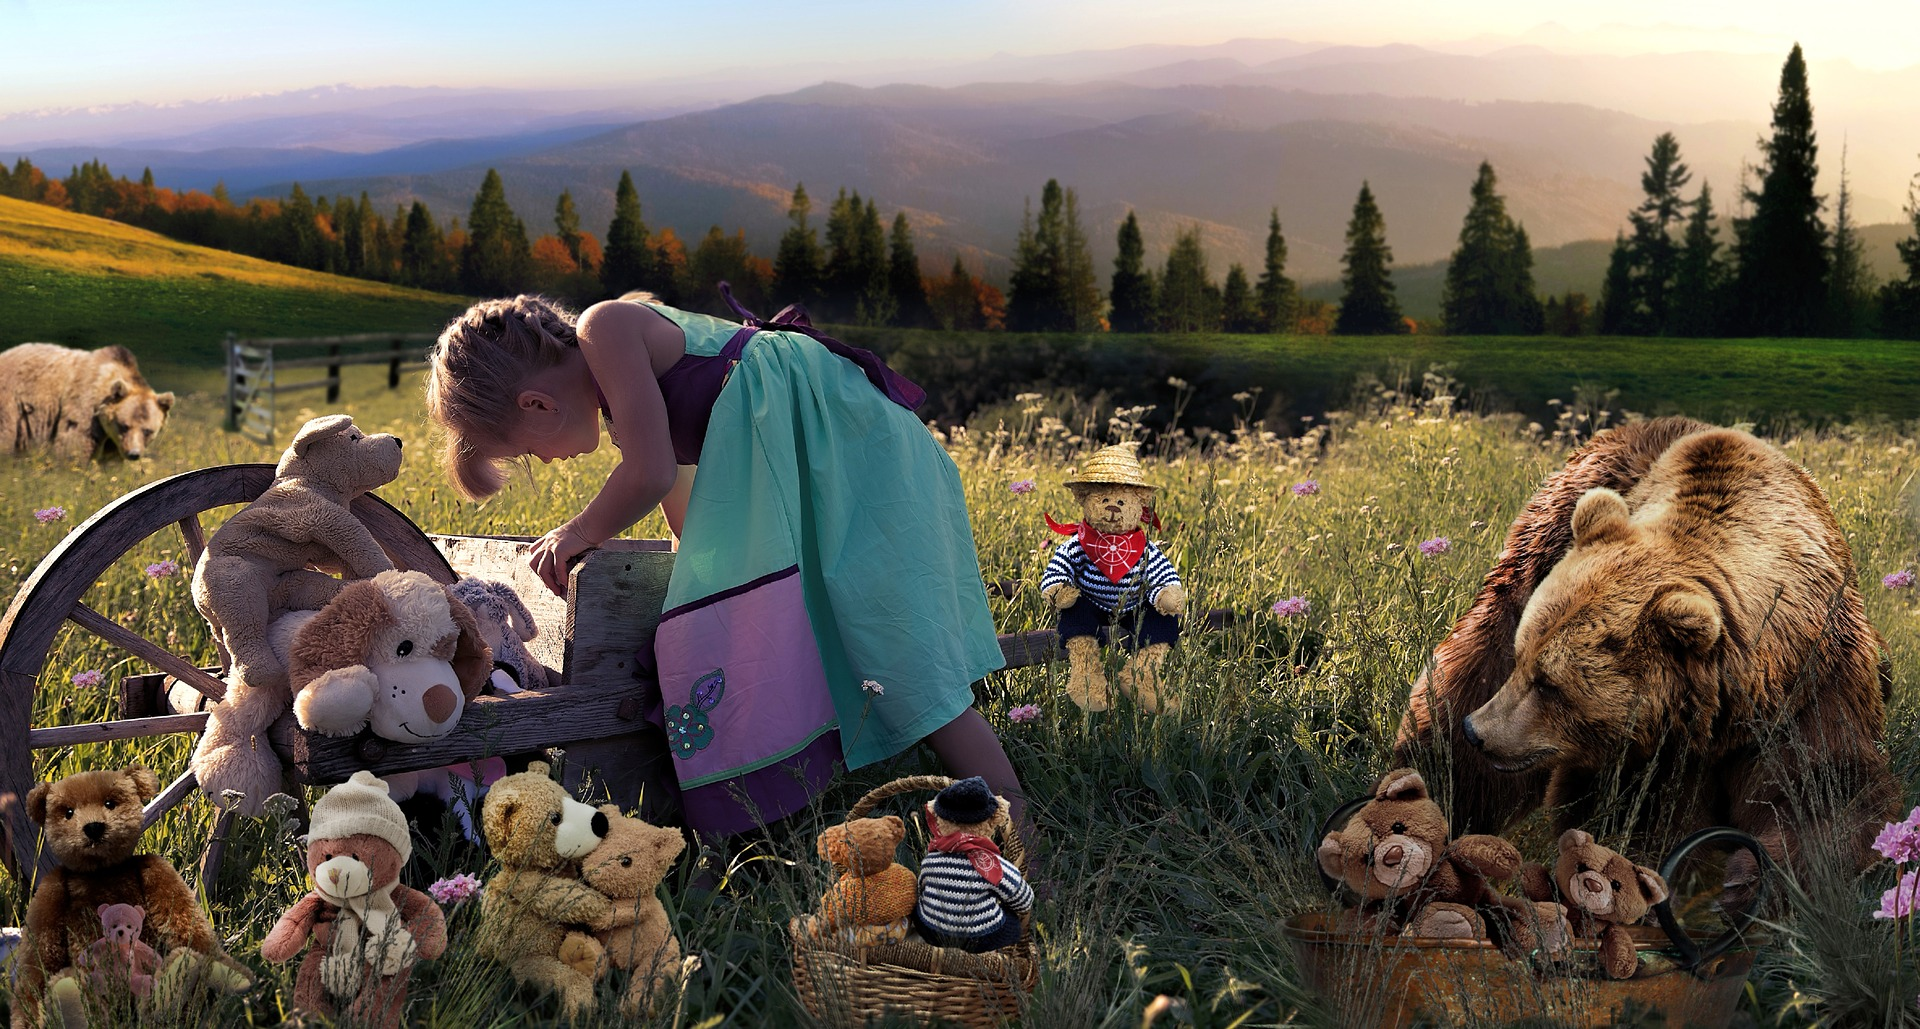 Child with teddies in field